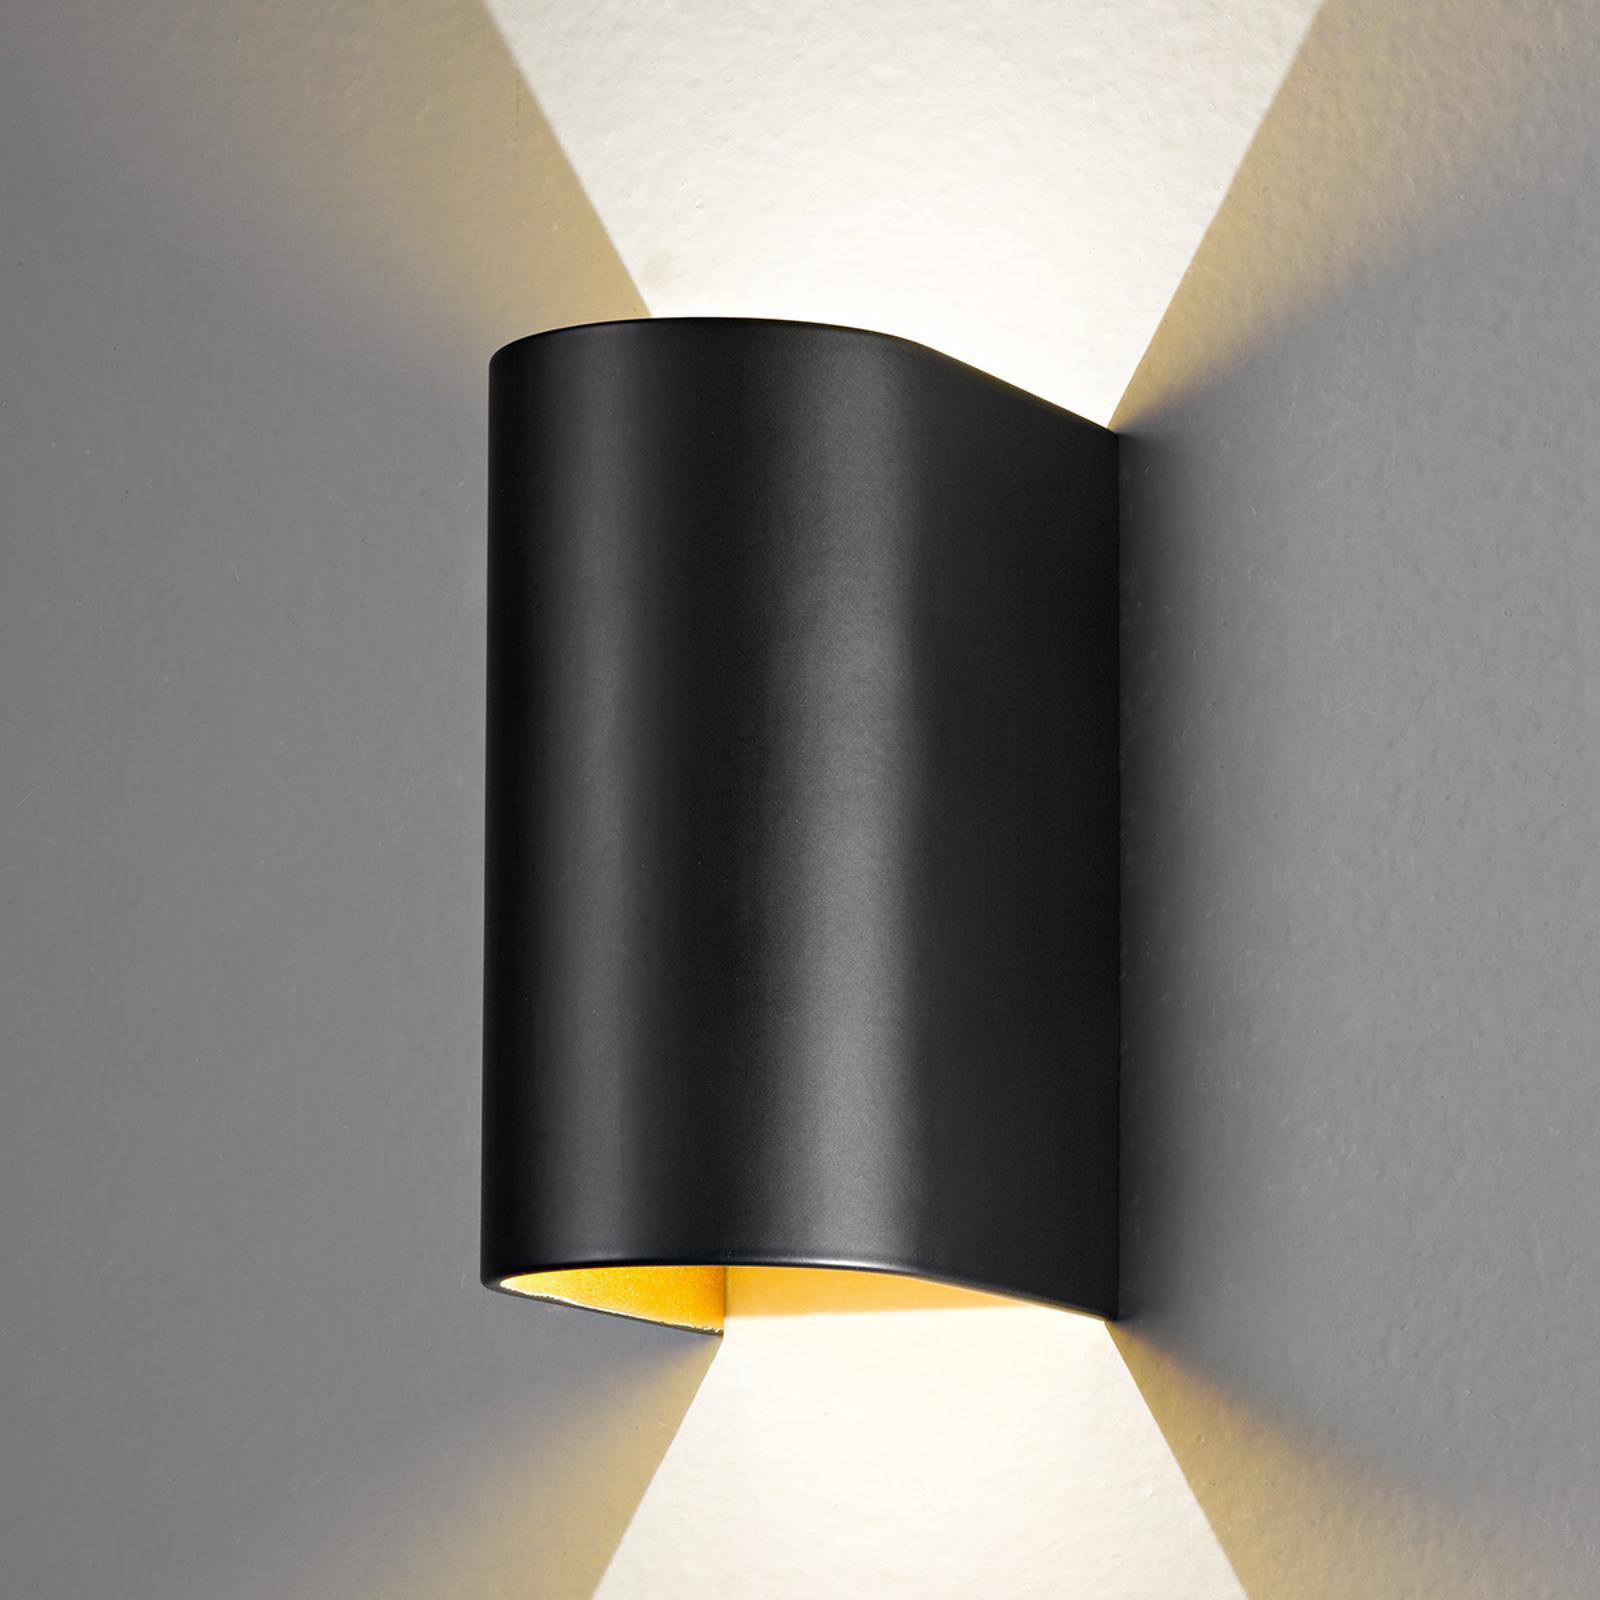 LED-Wandleuchte Feeling, schwarz-gold